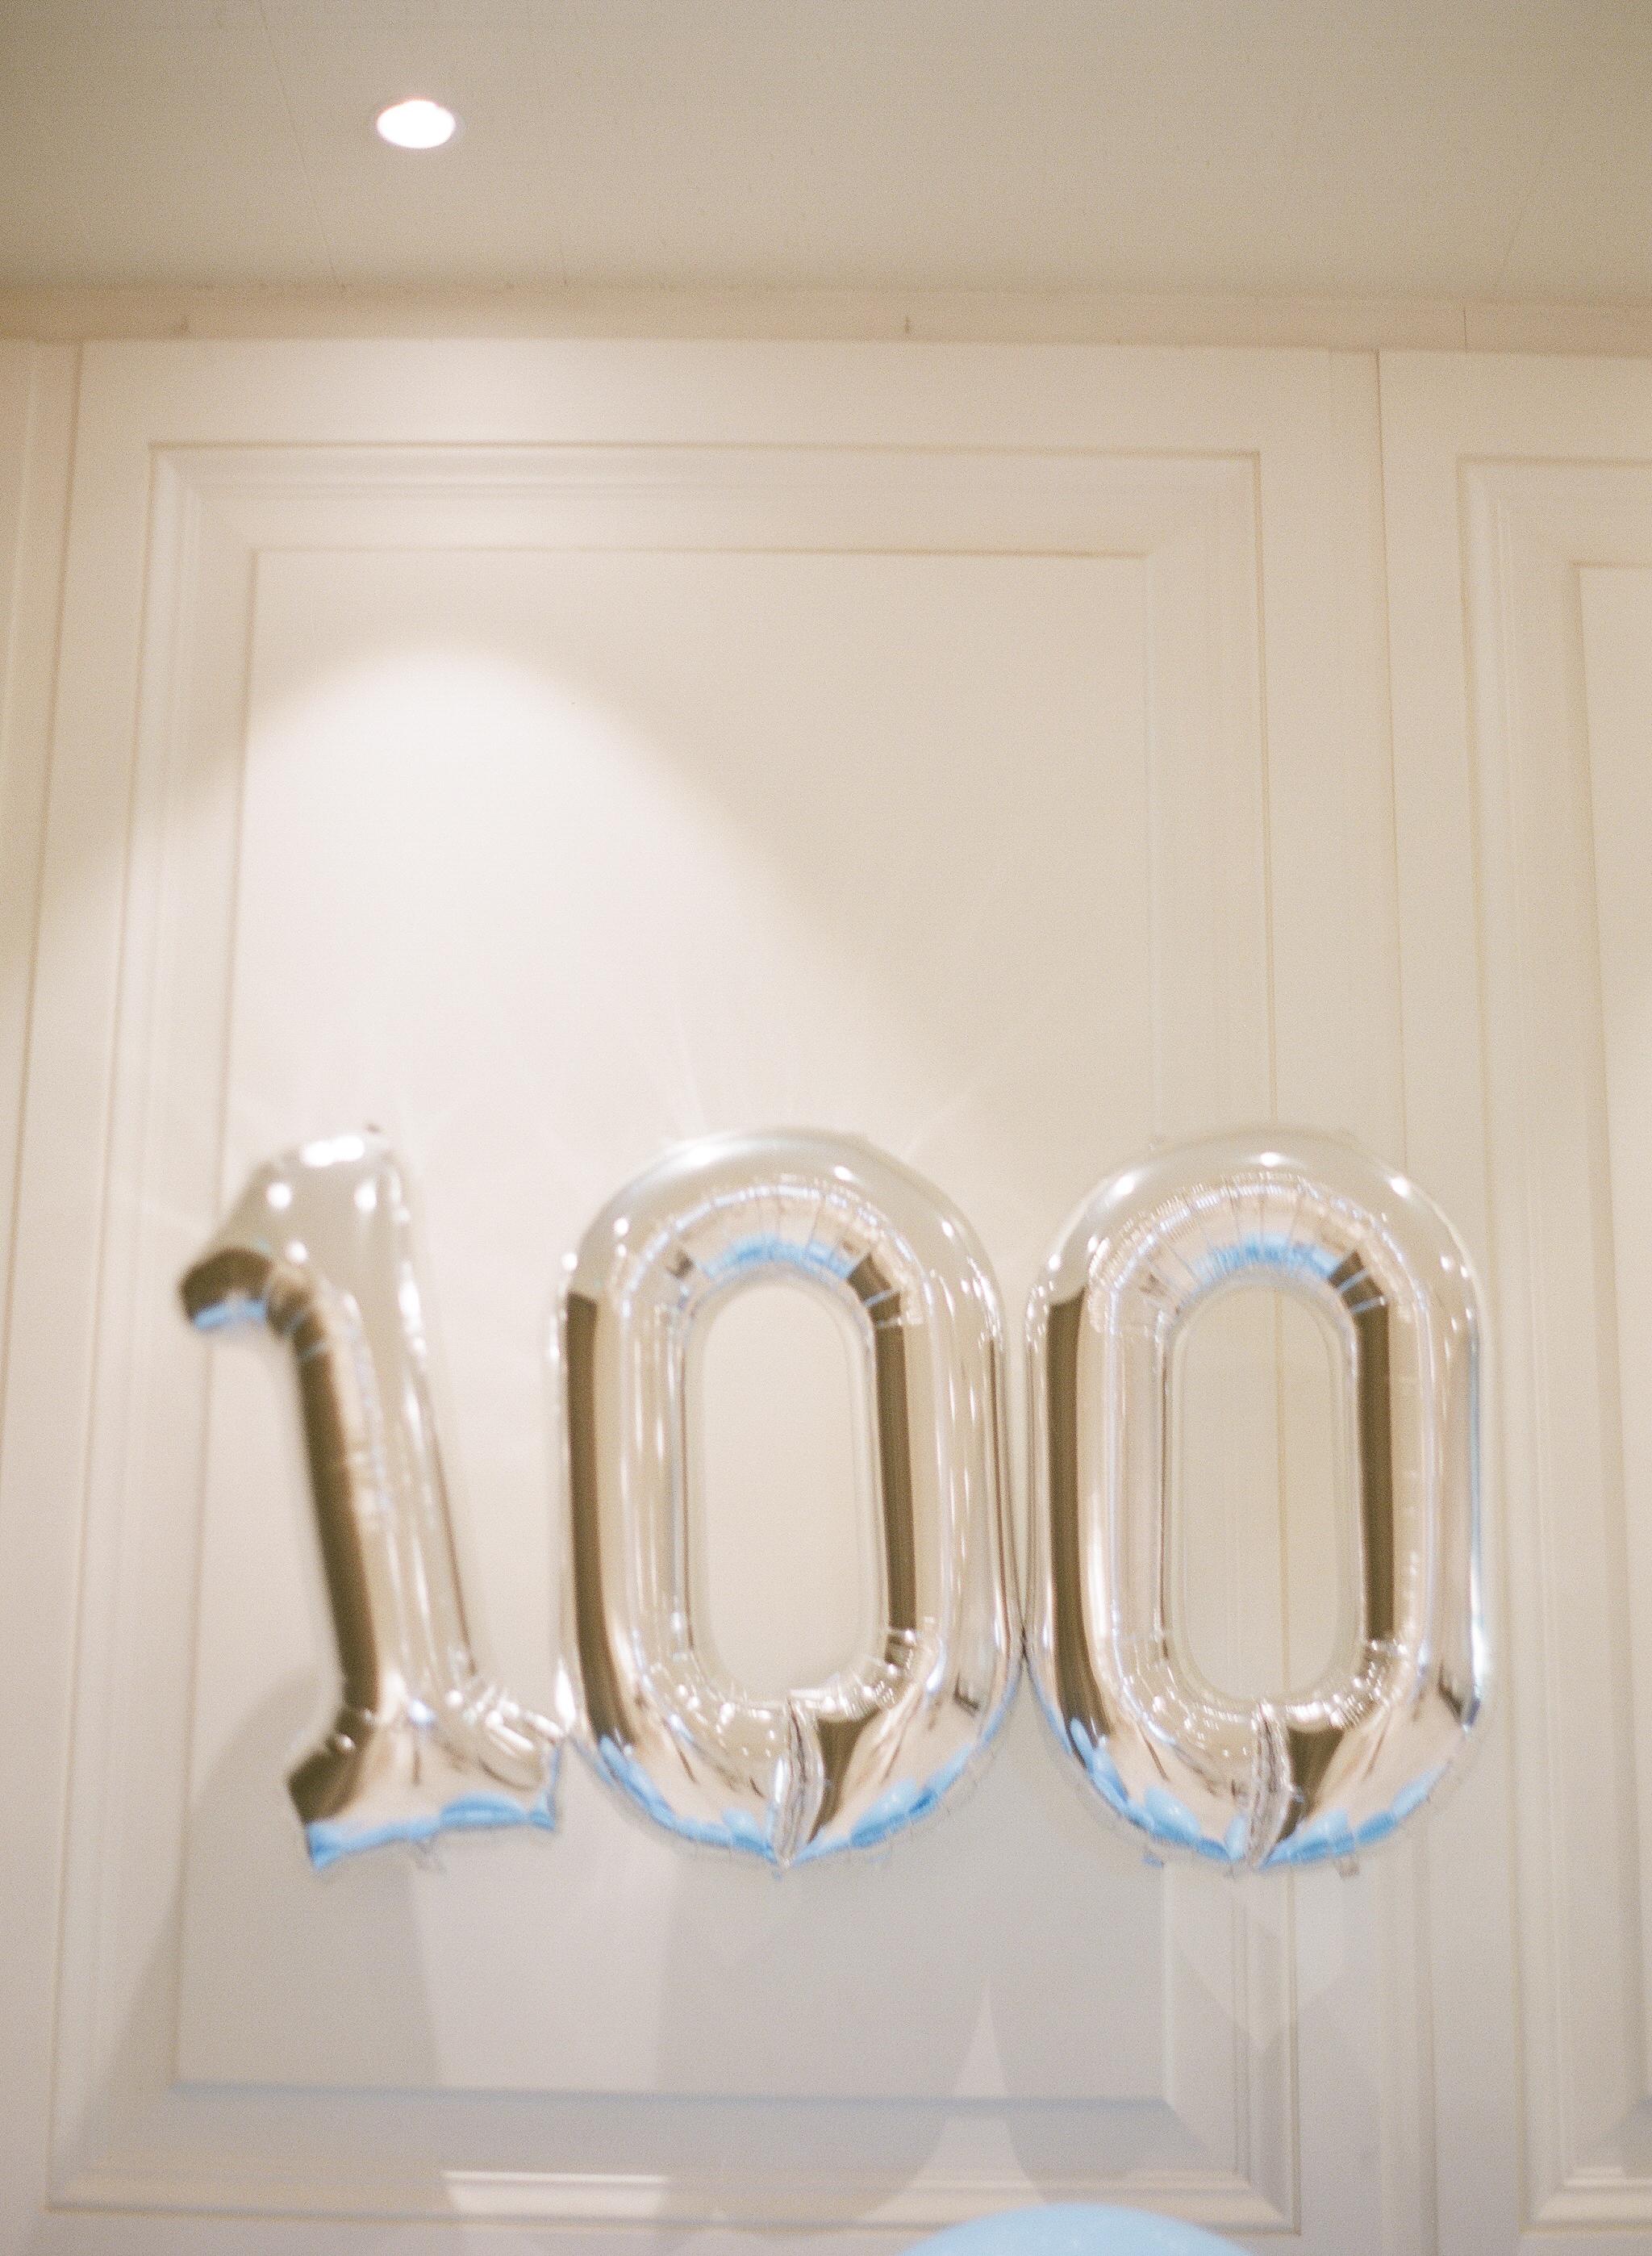 Ryan's100DayHiRes (89 of 371) - 000051960014.jpg